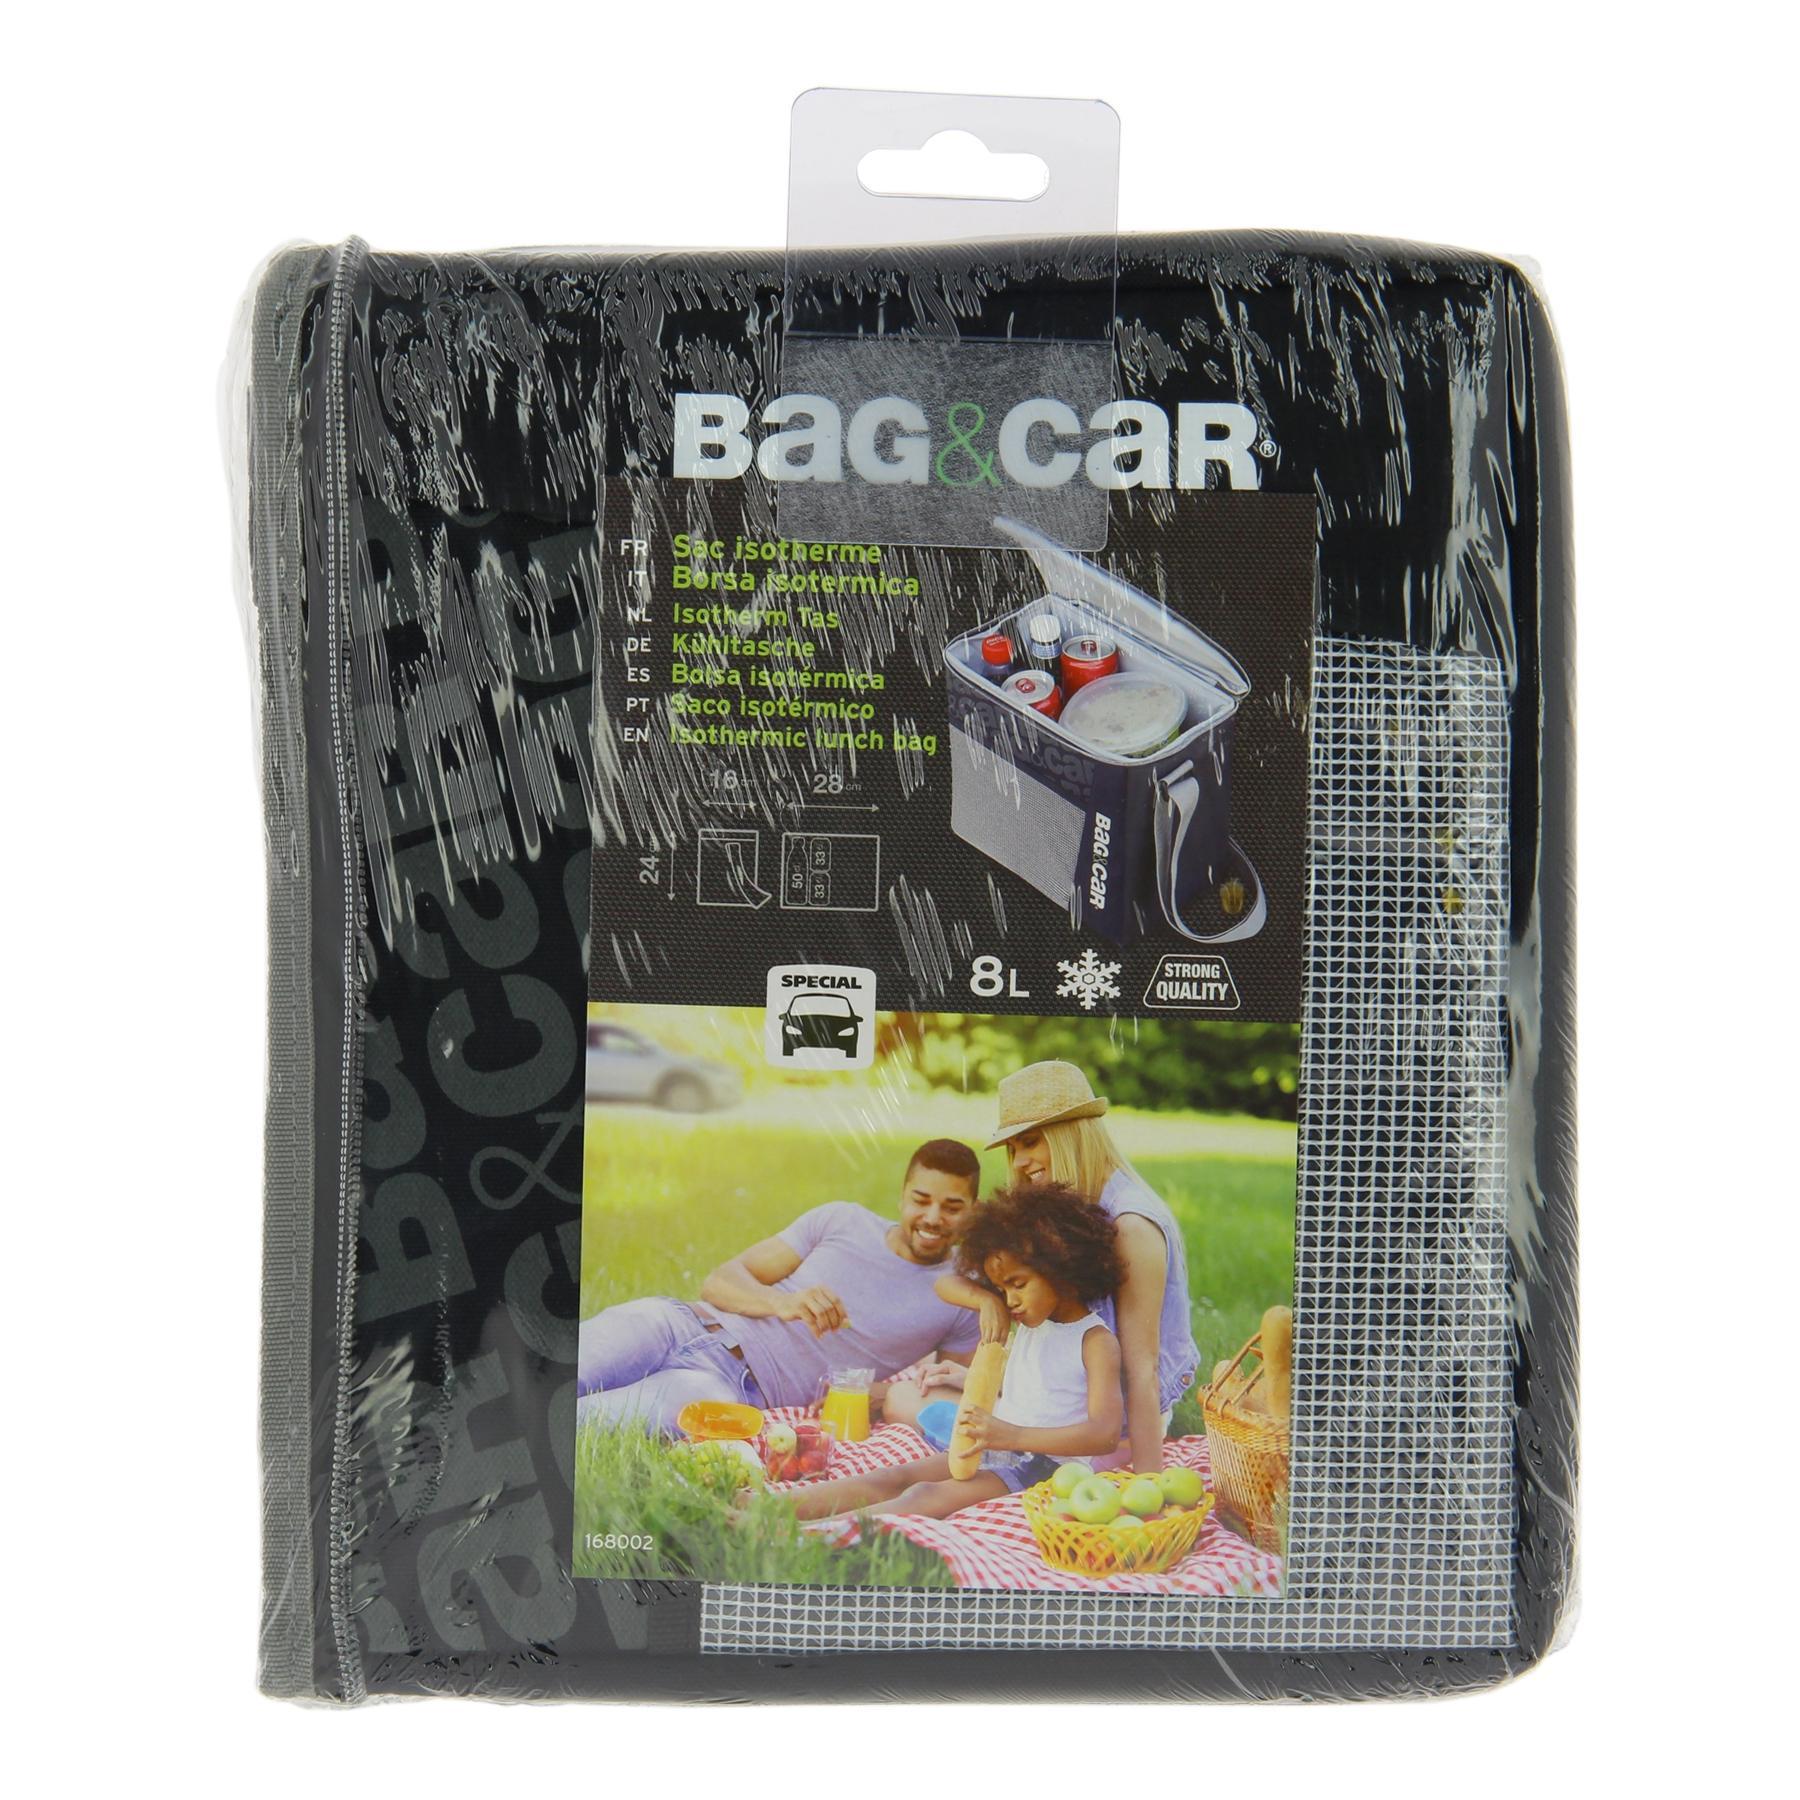 Cooler bag BAG&CAR 168002 rating